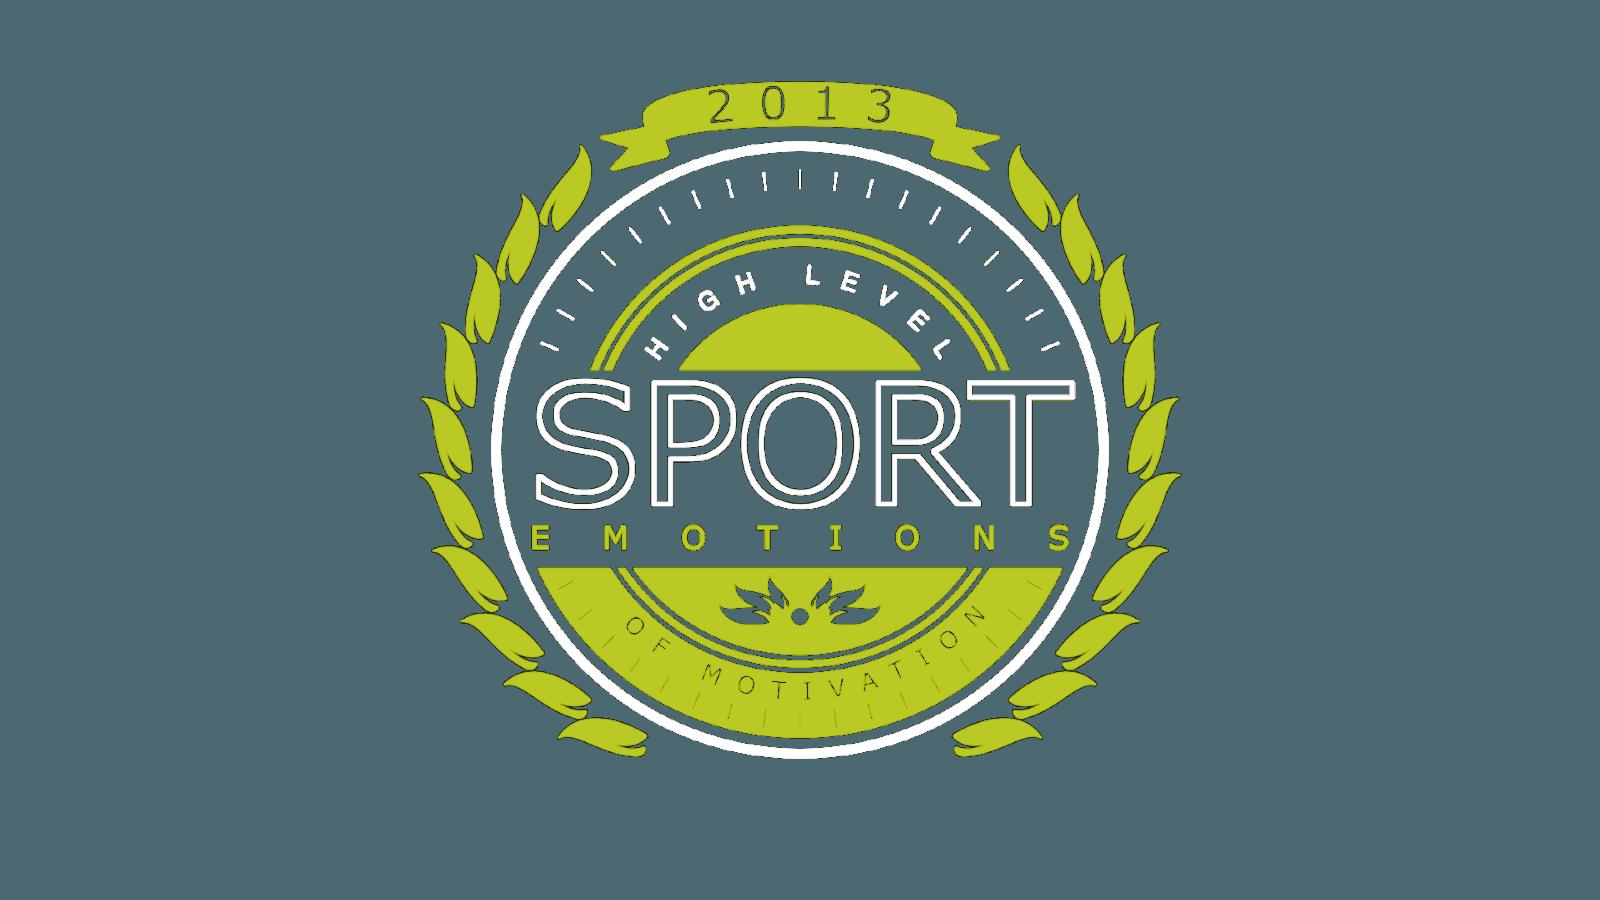 Sport Emotions